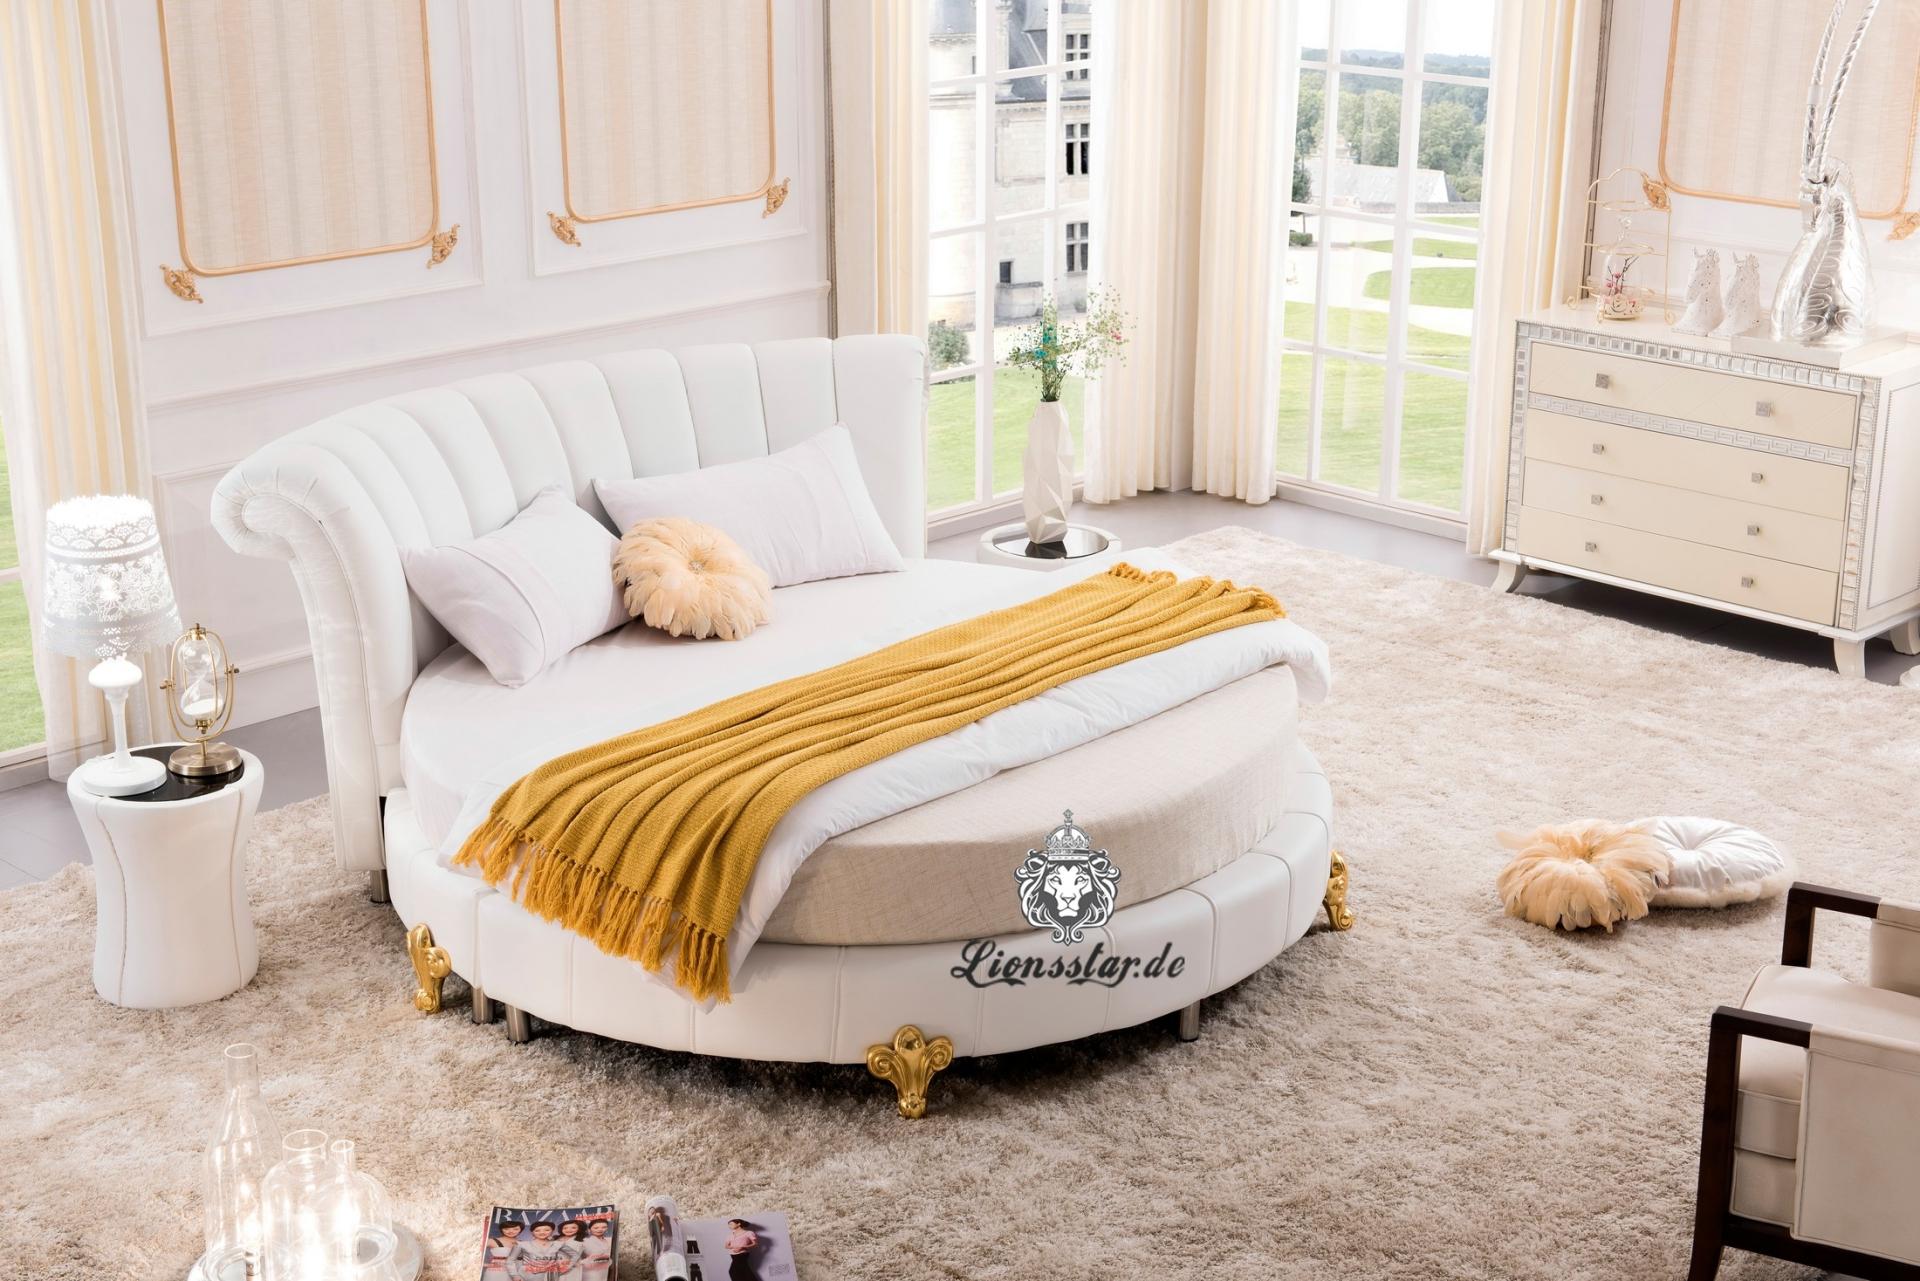 barock bett wei himmelbett bett antik wei barock engel gold barockbett spiegel polsterbett so. Black Bedroom Furniture Sets. Home Design Ideas